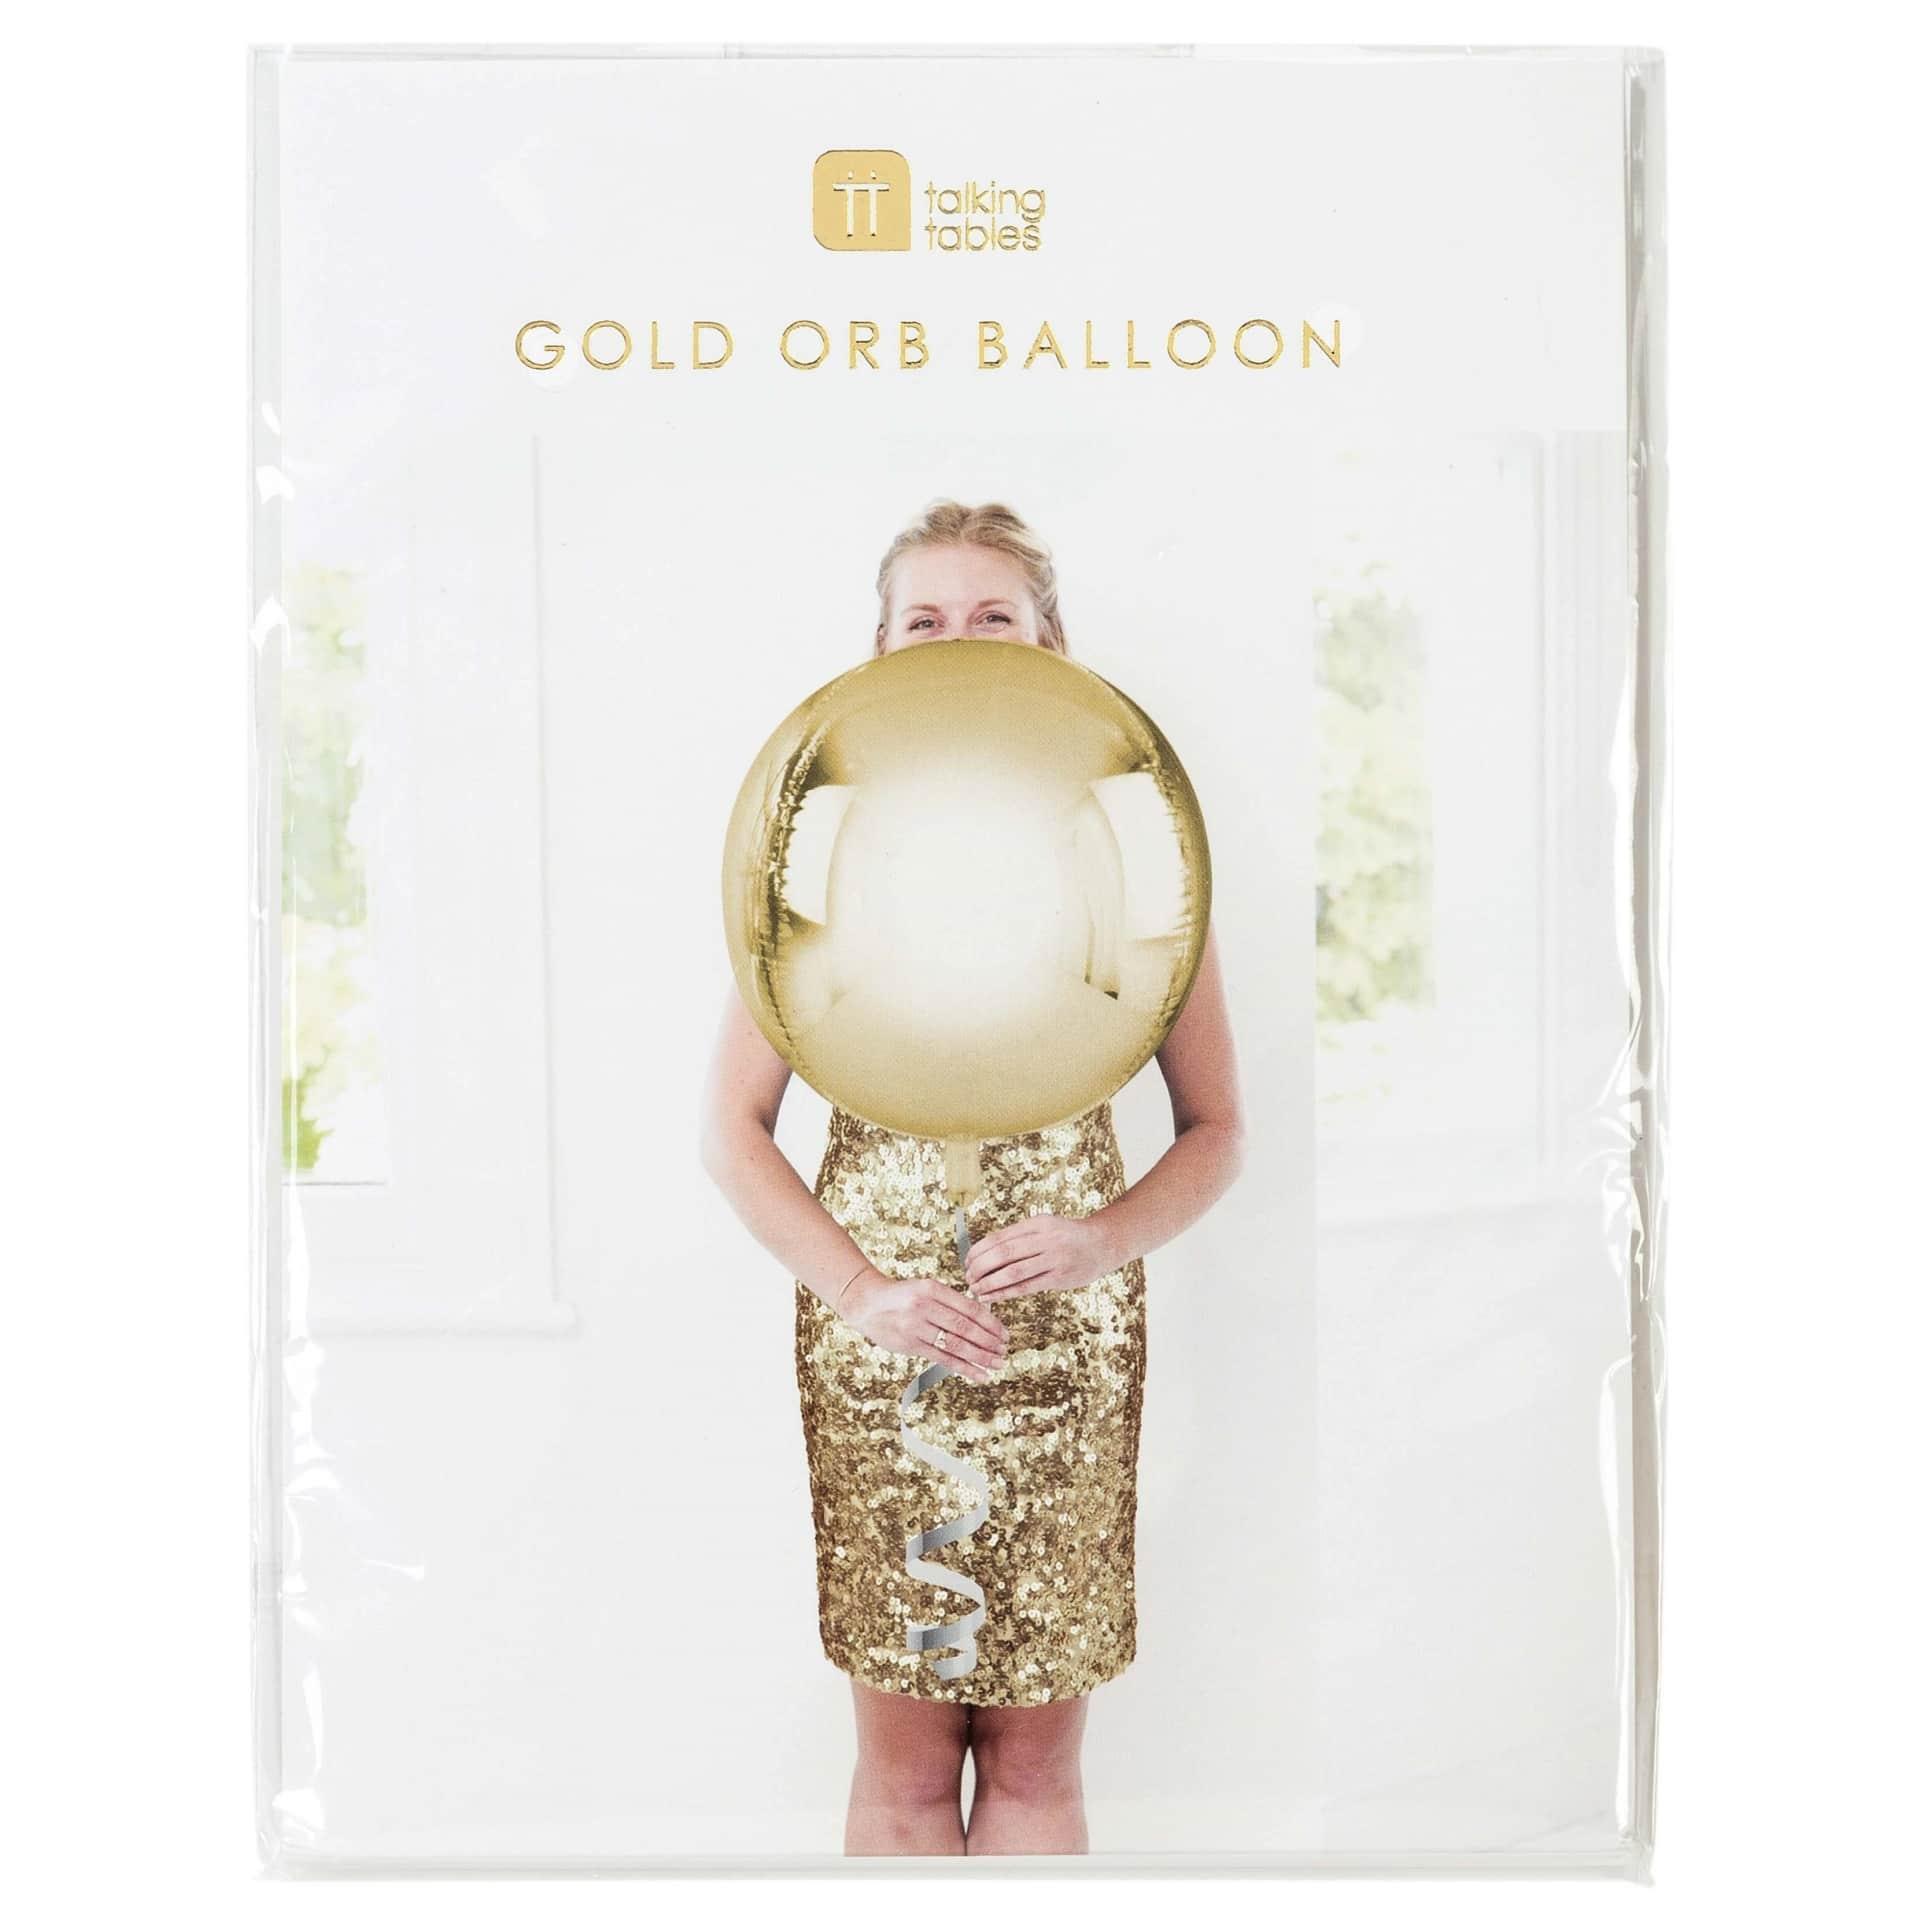 Talking Tables Nafukovací balón Gold ⌀ 38 cm, zlatá barva, plast